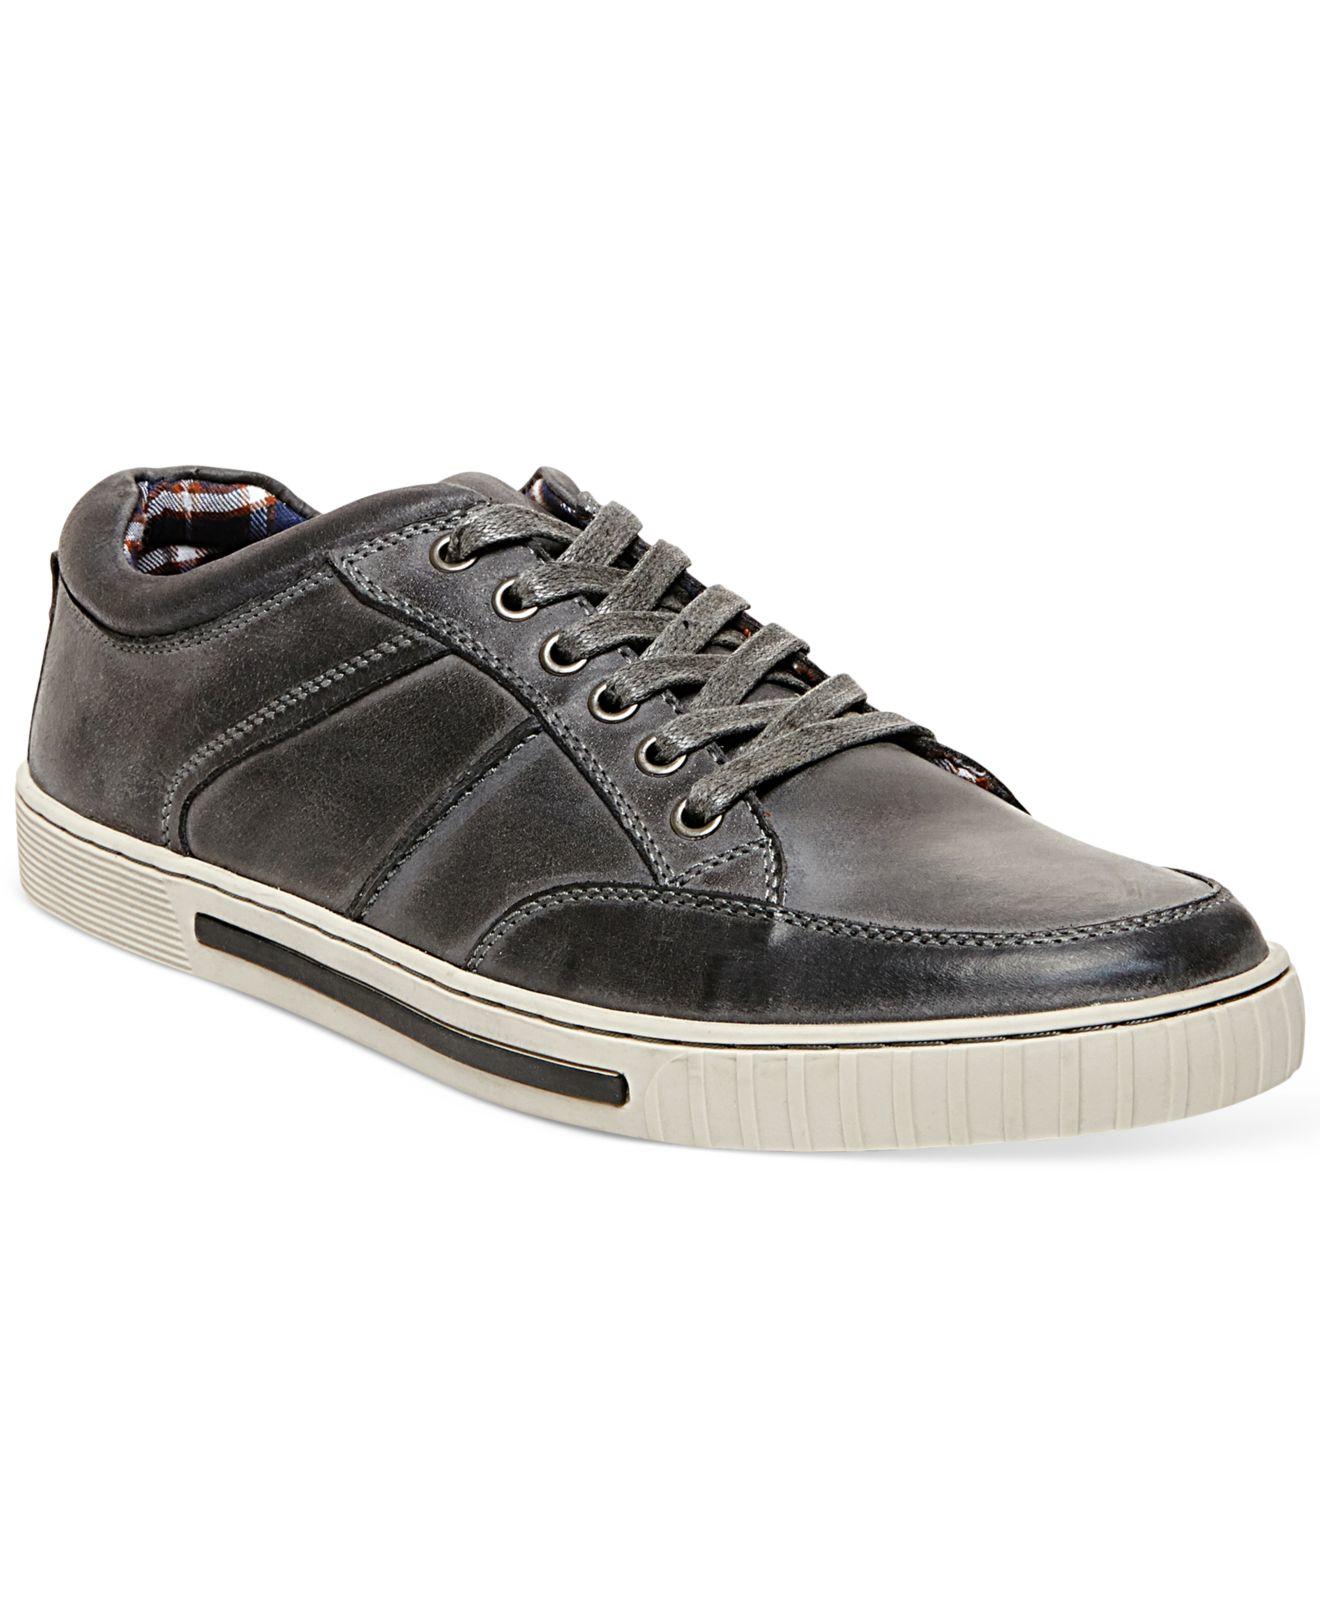 0e462a75fec Lyst - Steve Madden Pipeur Sneakers in Gray for Men